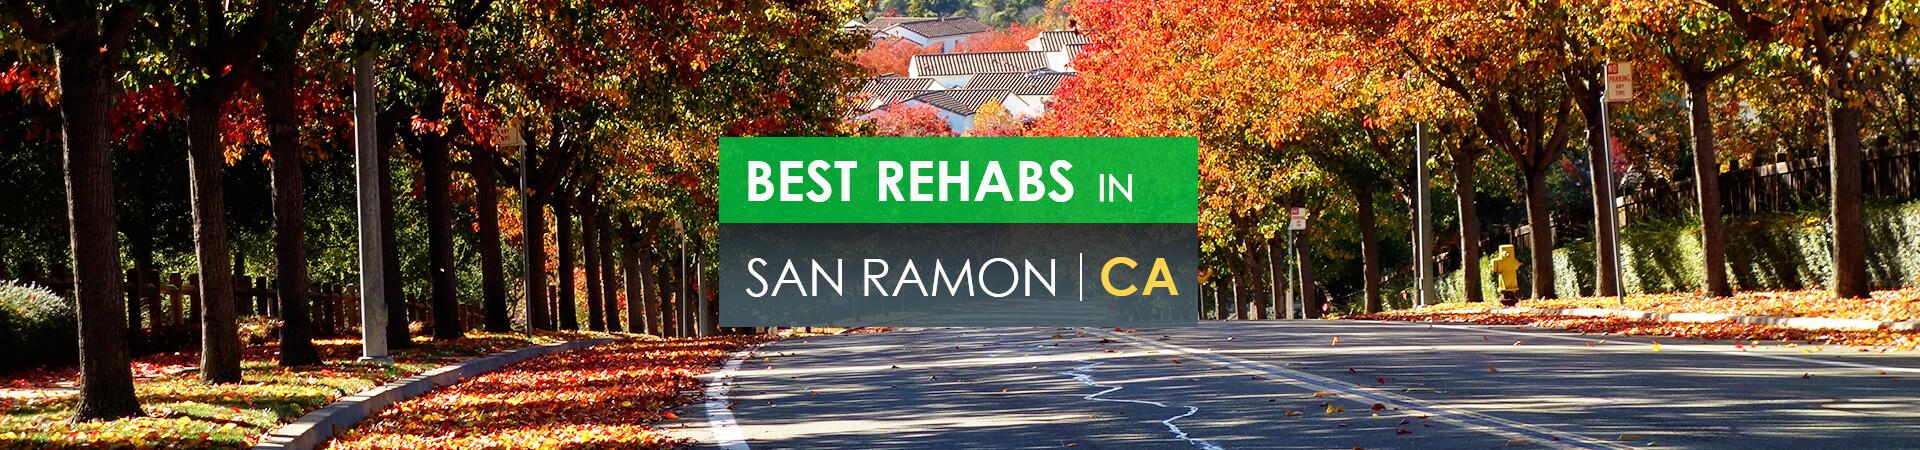 Best rehabs in San Ramon, CA